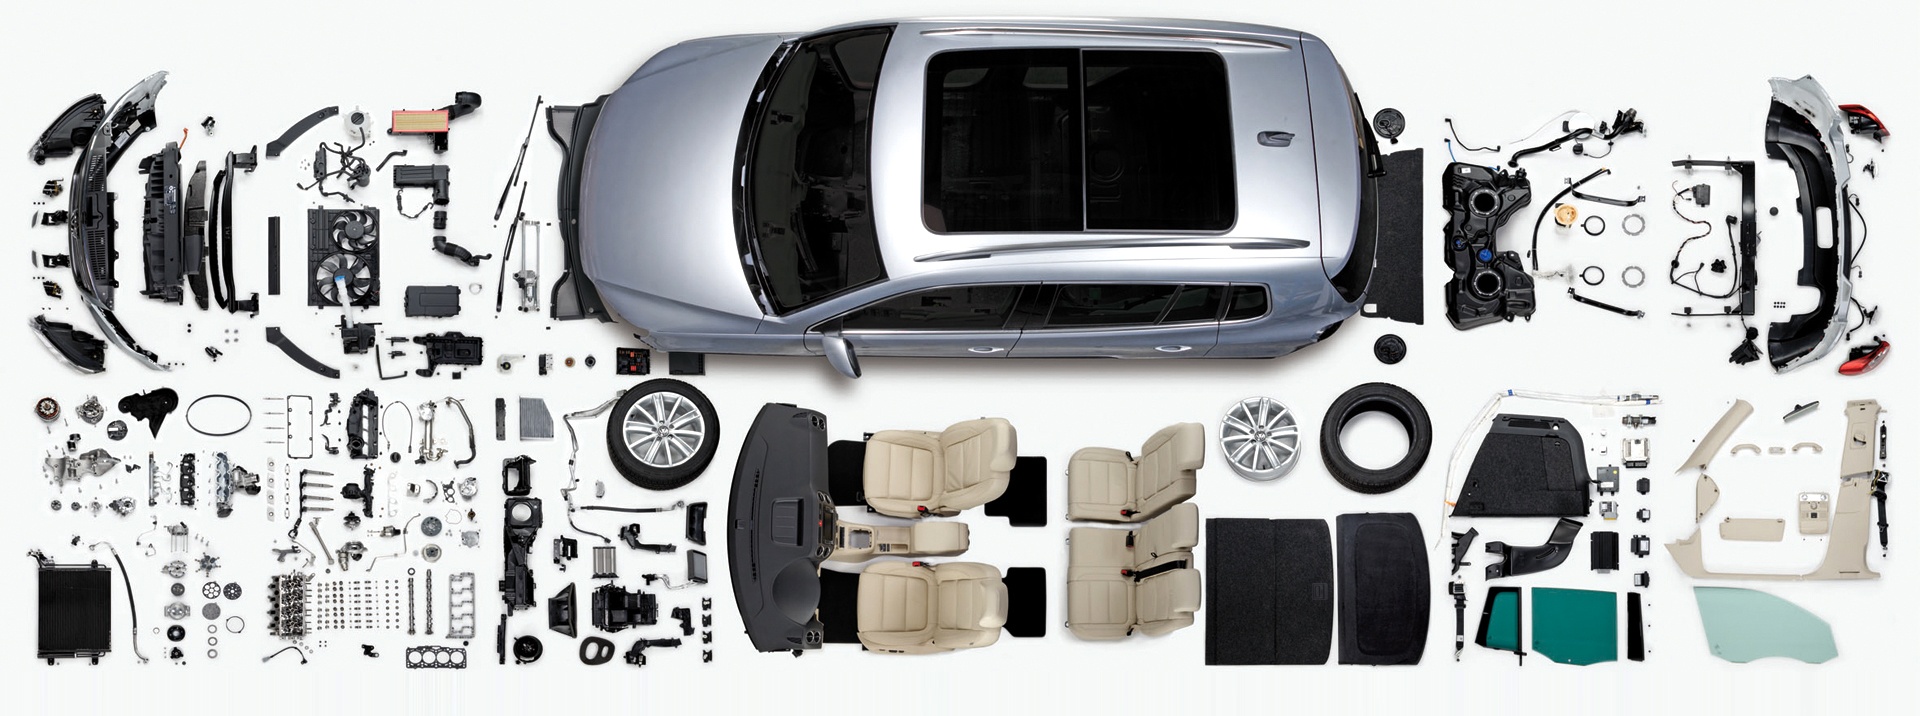 Volkswagen Parts Uk Genuine Accessories 94 Cadillac Engine Diagram